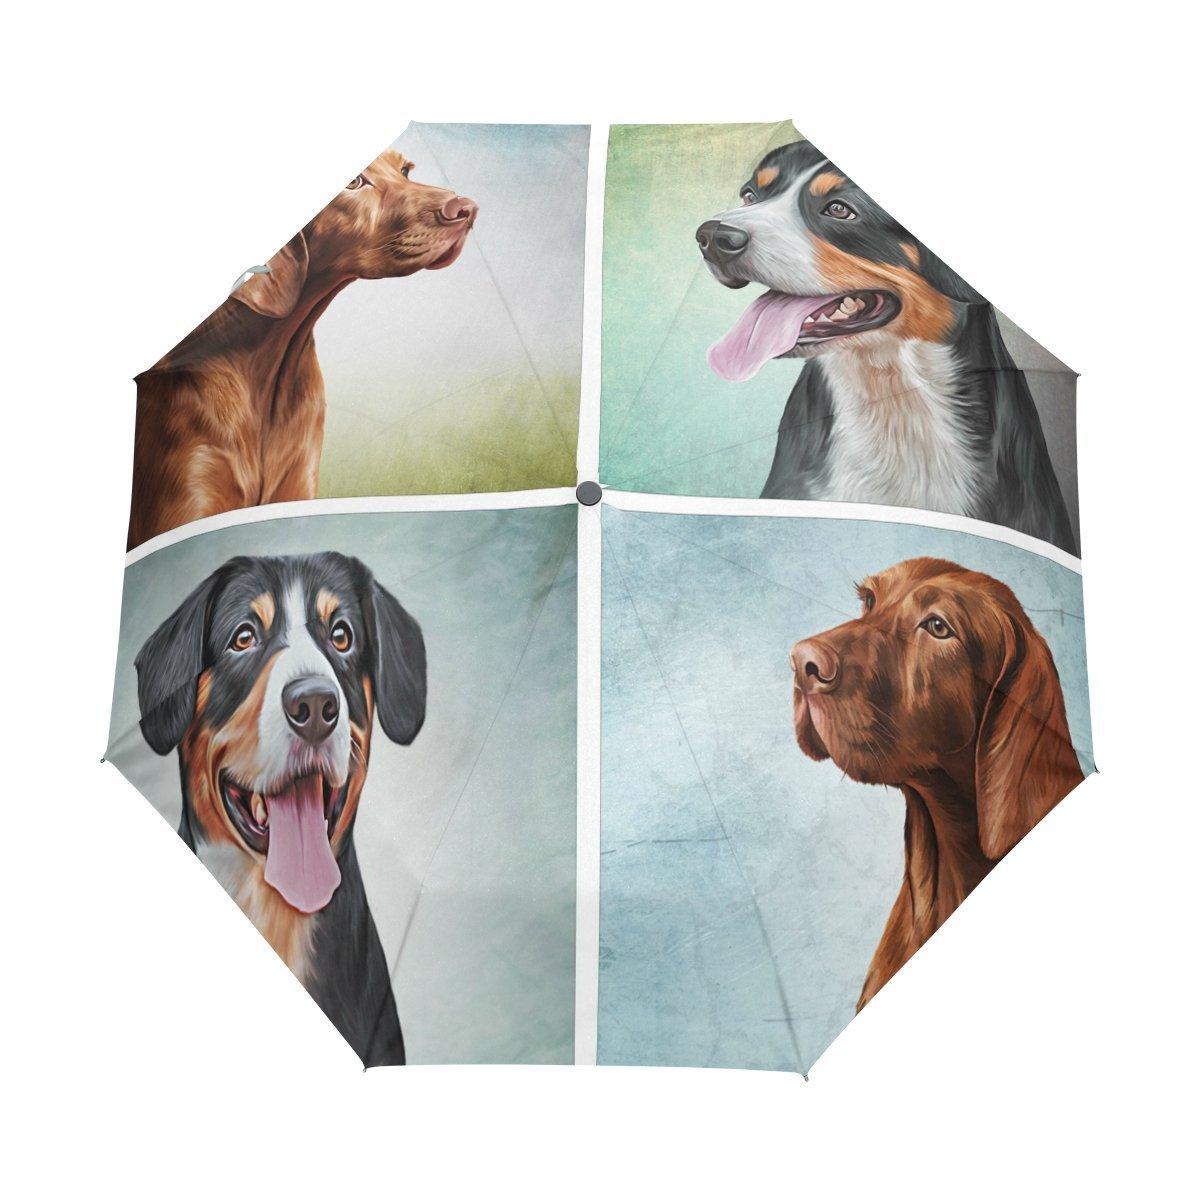 WOZO Funny Dog Puppy Dachshund Pug 3 Folds Auto Open Close Umbrella